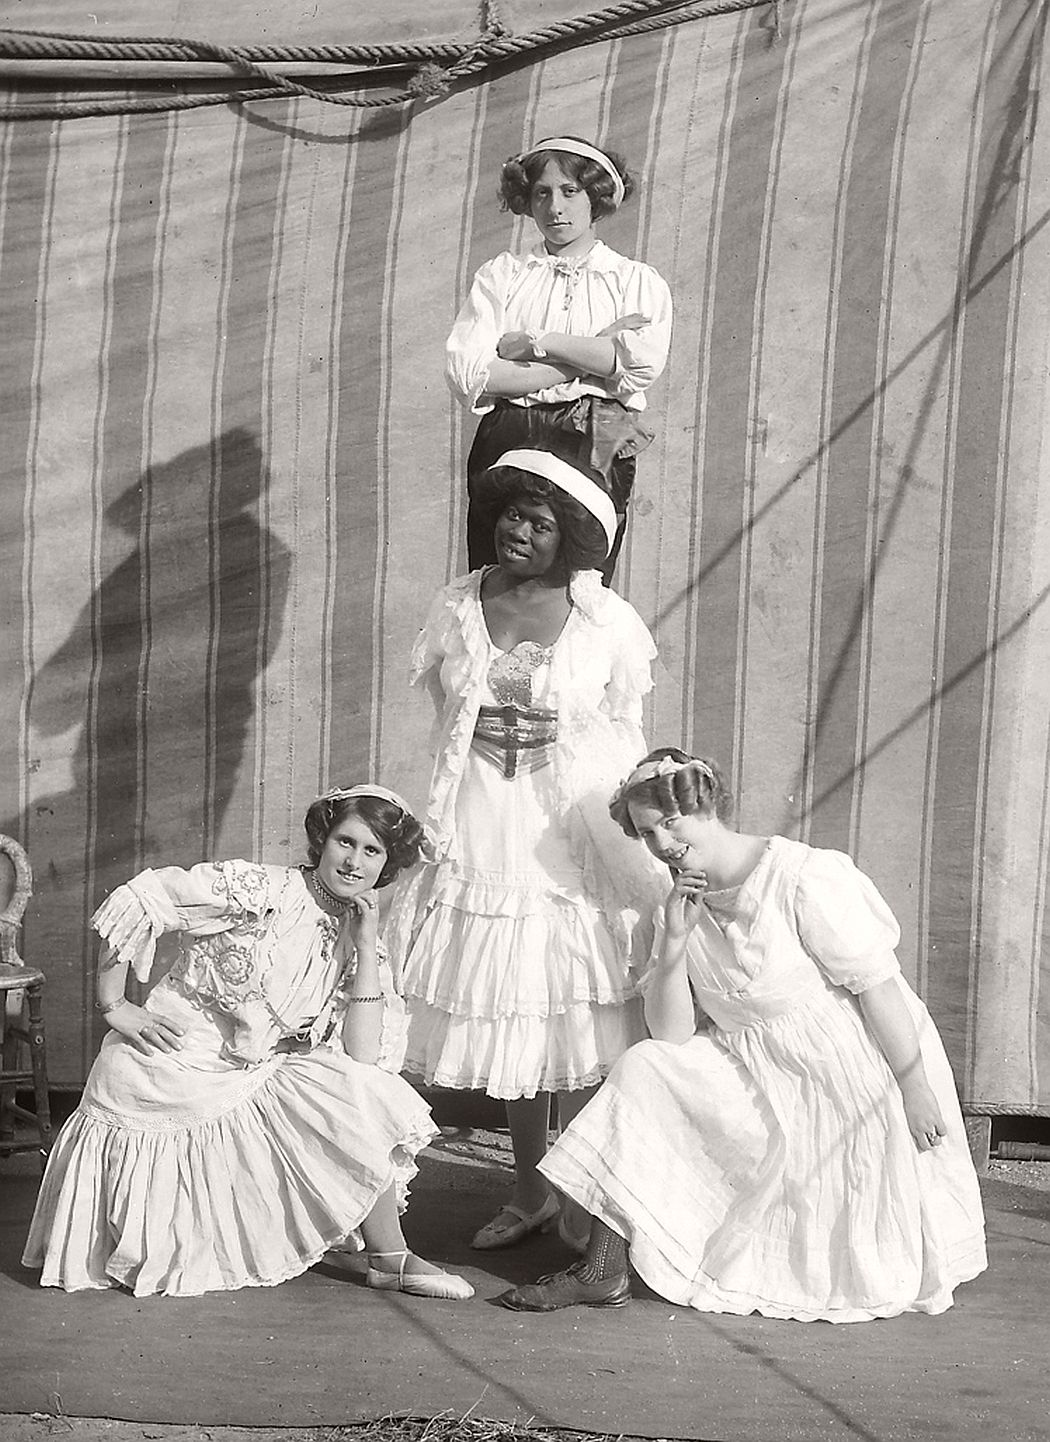 vintage-circus-performers-in-strabane-1910-1911-09